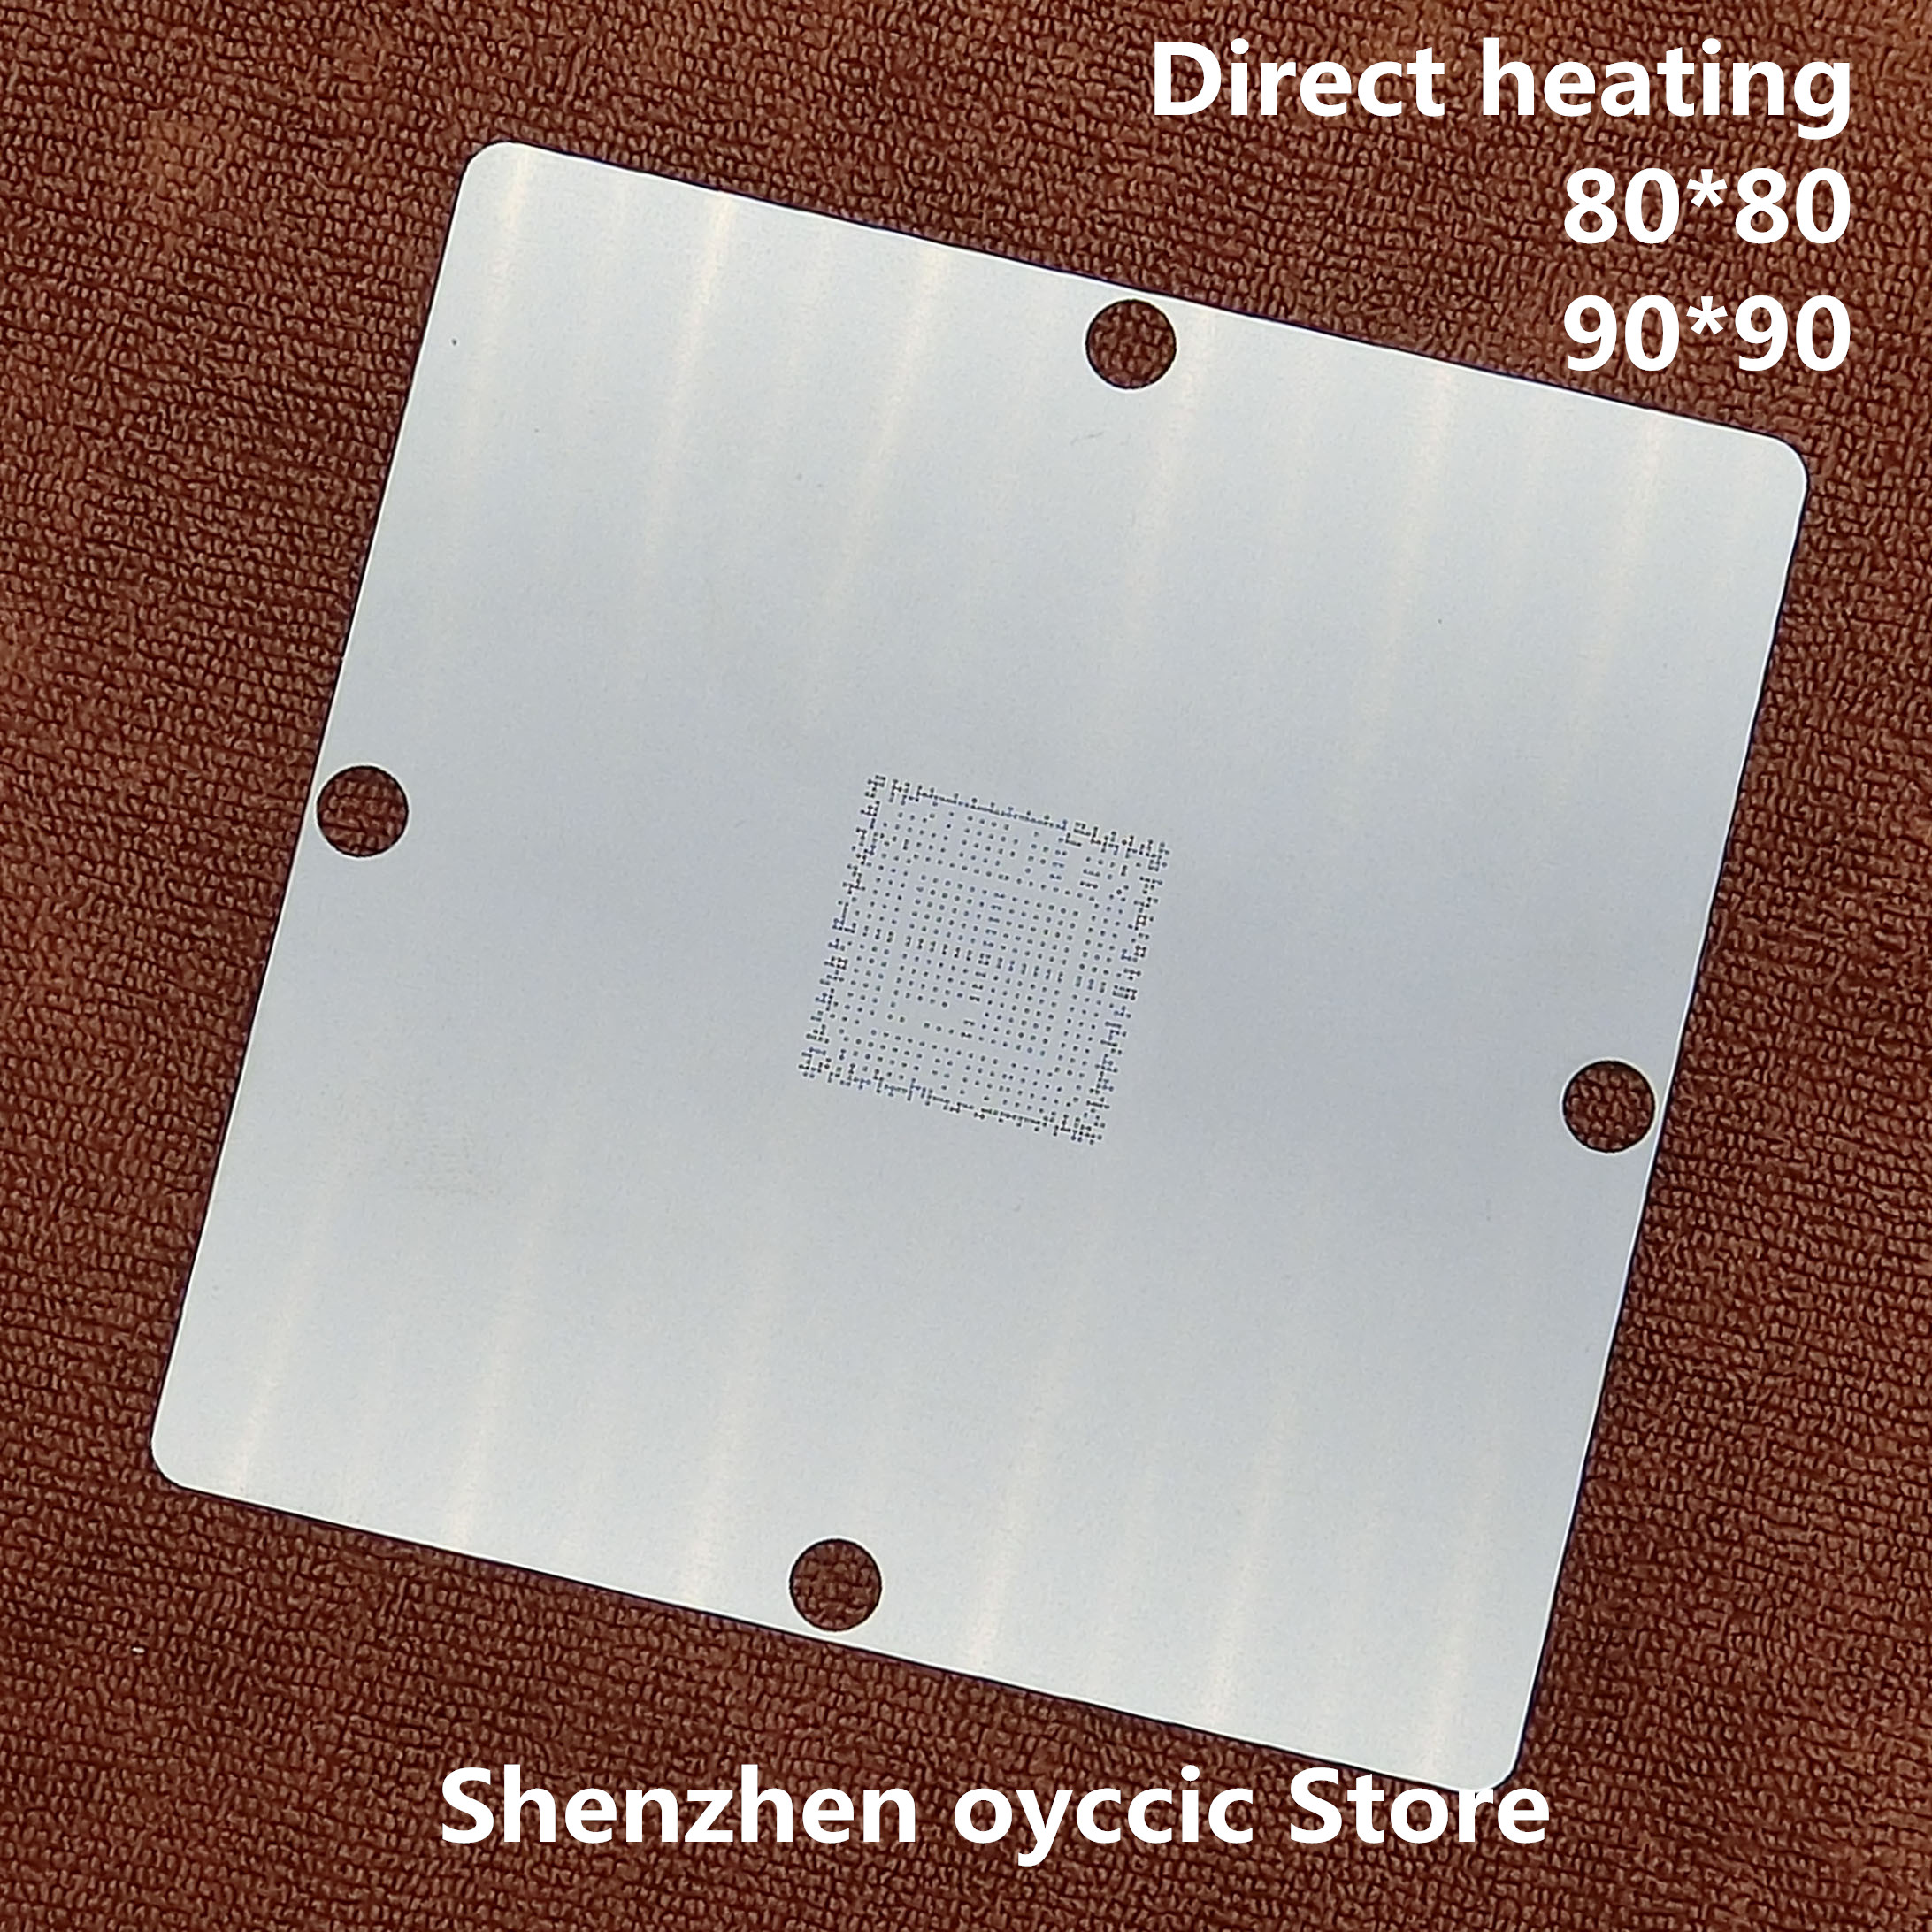 Direct Heating 80*80 90*90  DE3114-A1   88DE3114-A1  DE3214-BO  DE3214-B0  BGA Stencil Template